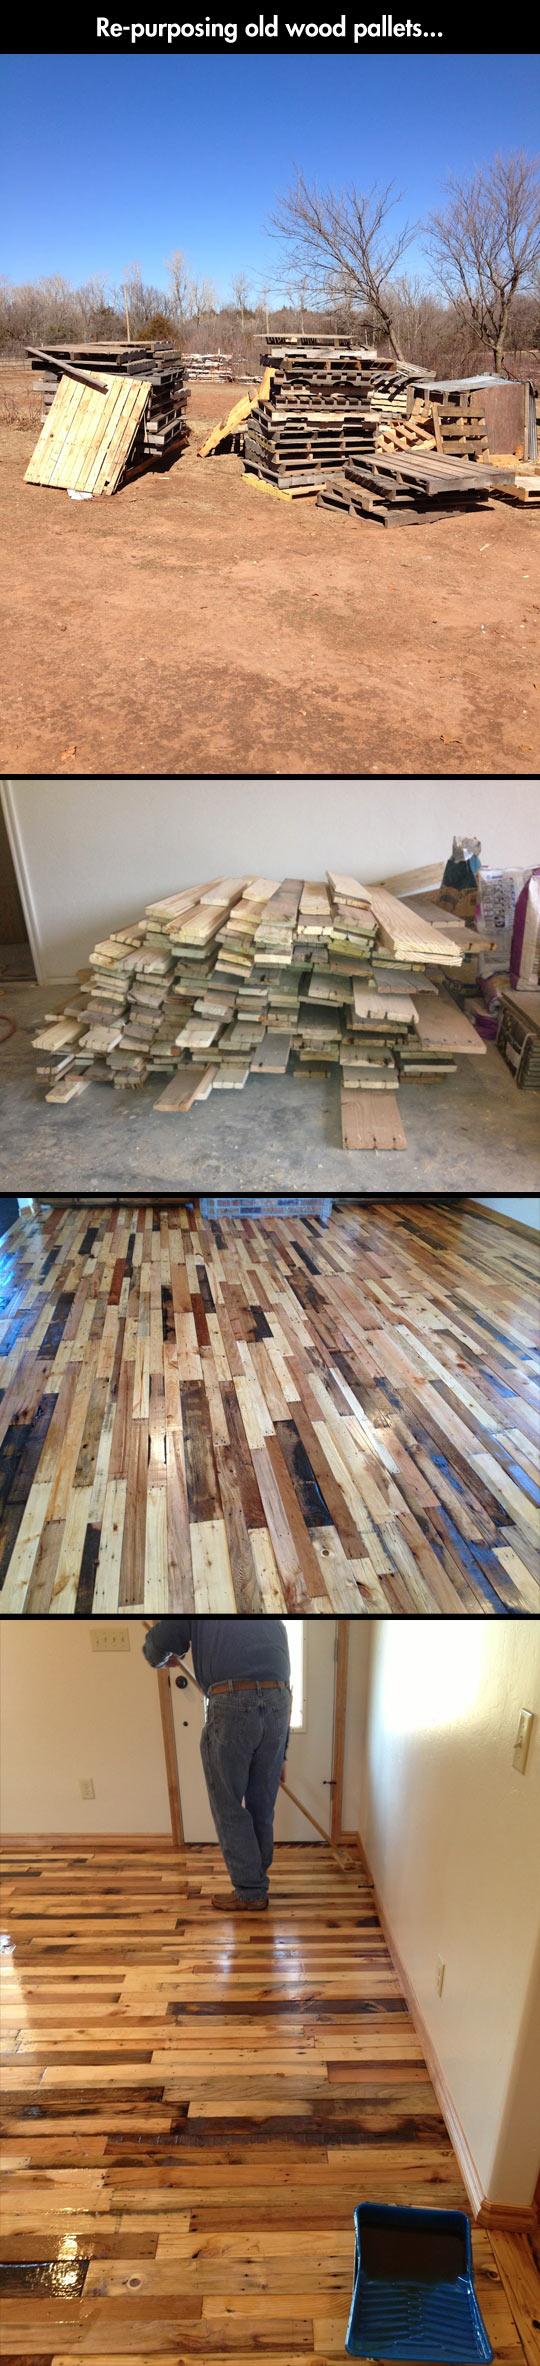 funny-old-wood-floor-reusing